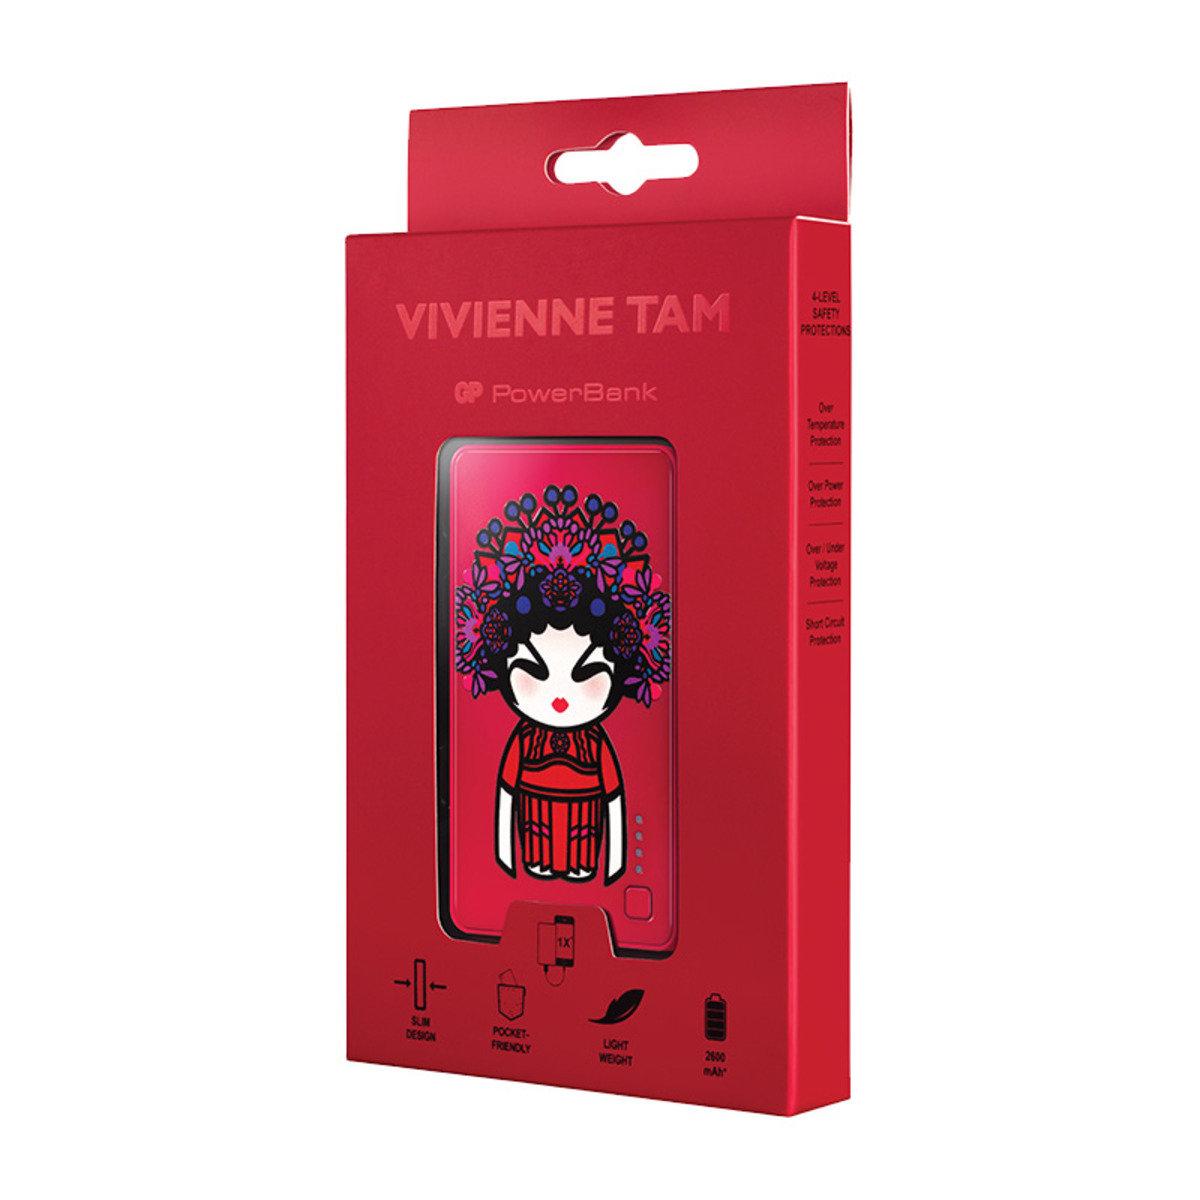 Vivienne Tam x GP限量版儲電寶P326 2600 mAh - 戲曲娃娃(紅色)